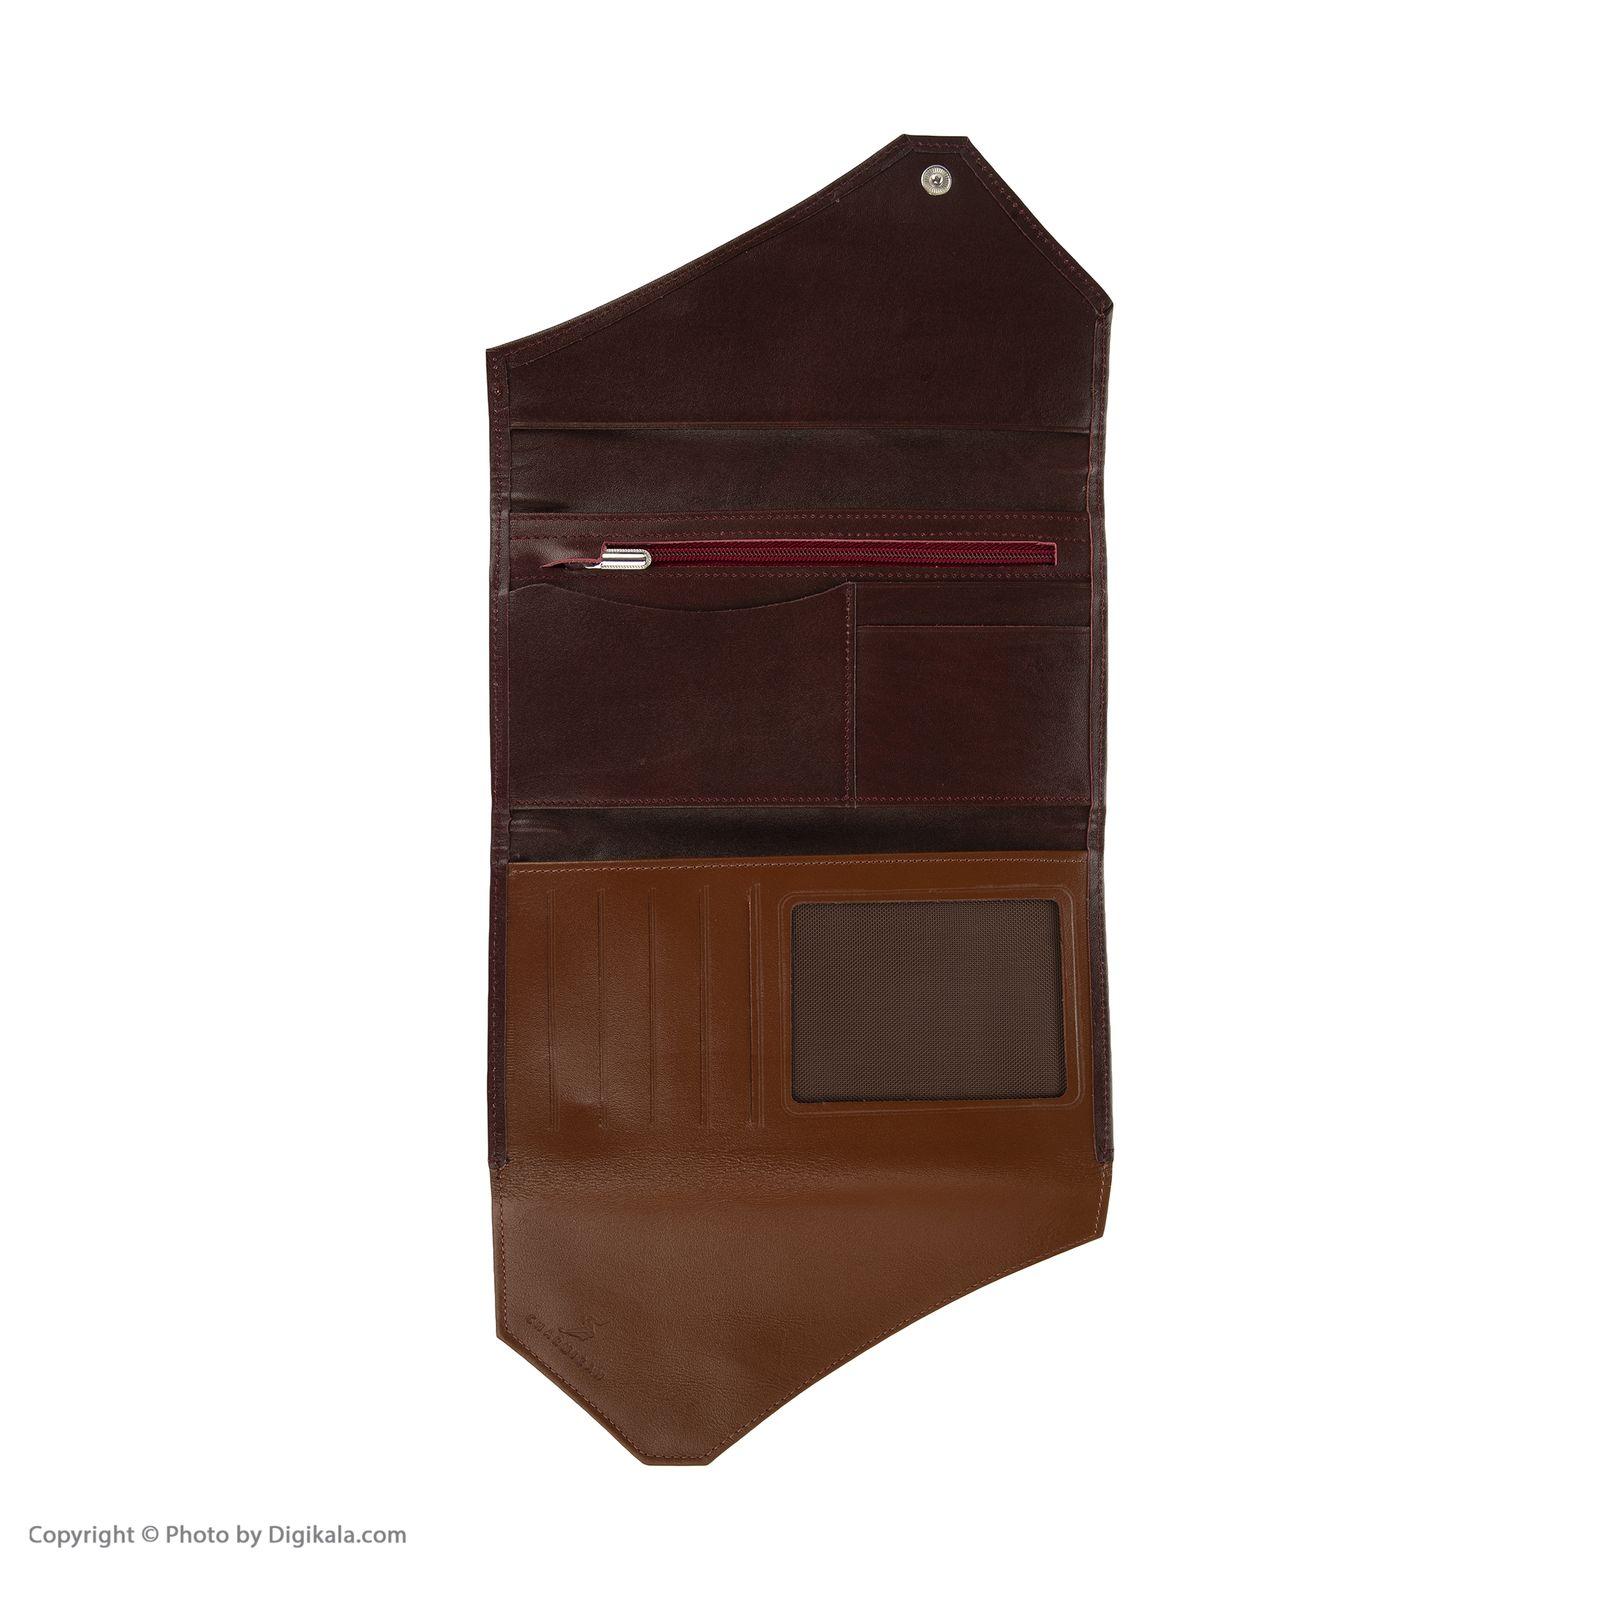 کیف پول چرمیران مدل 6059306 -  - 5